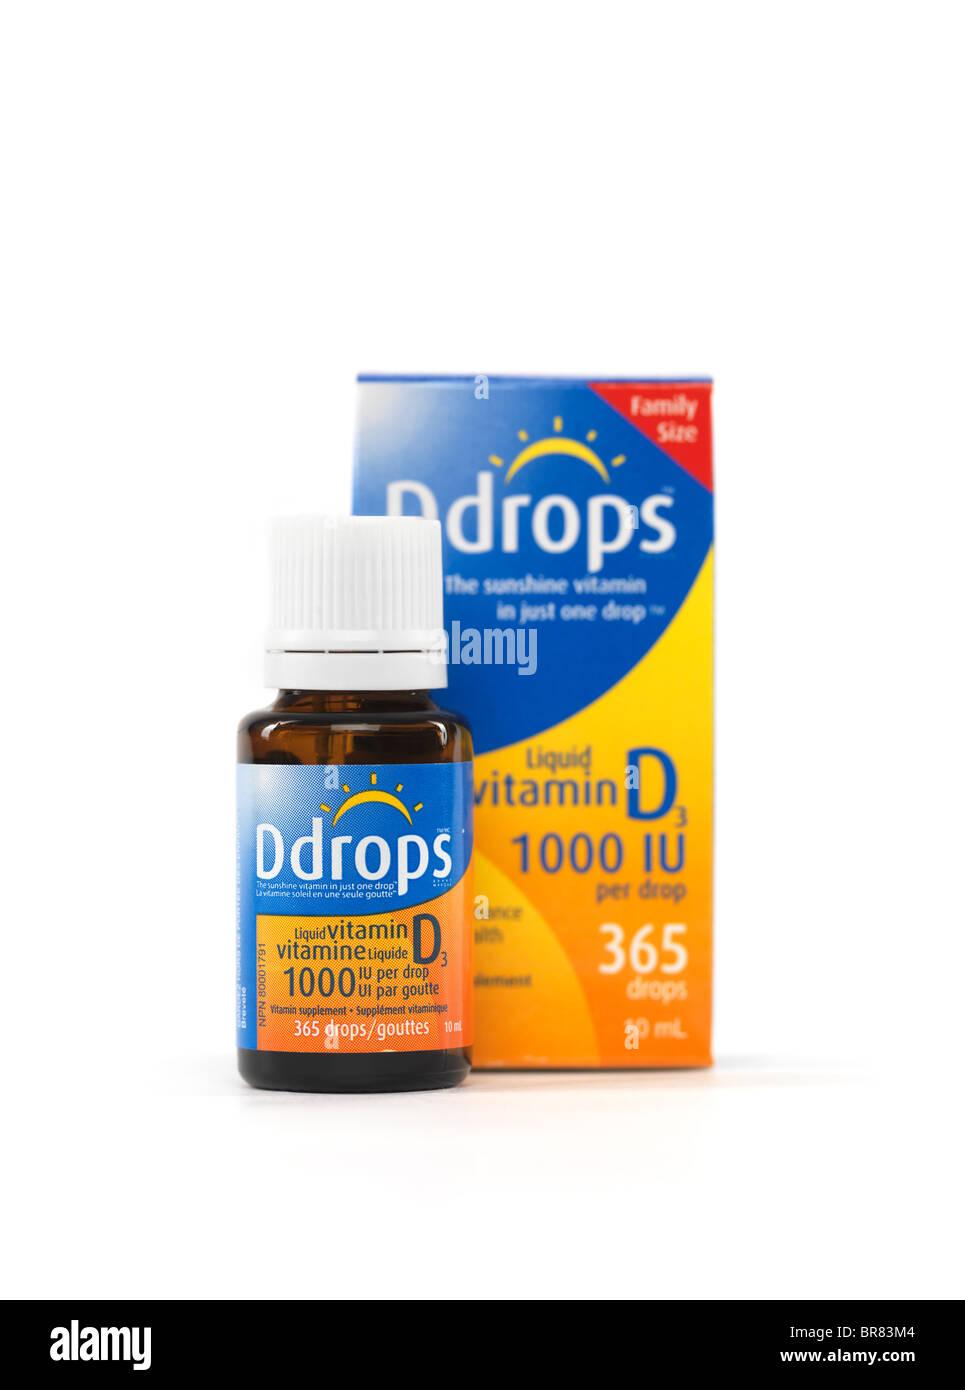 Gotas de vitamina D natural líquido Ddrops aislado sobre fondo blanco. Imagen De Stock